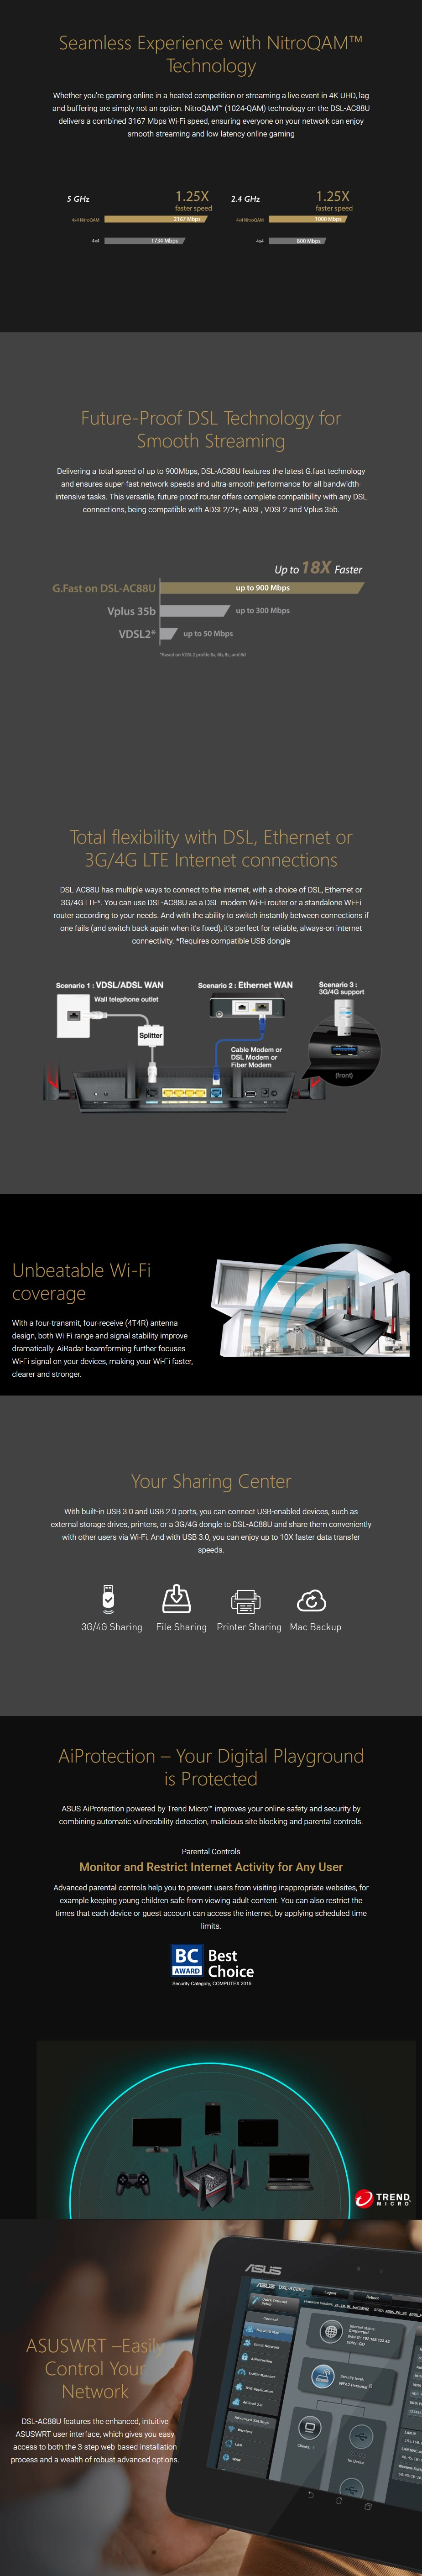 asus-rslac88u-dualband-gbe-ac3100-dualband-modem-router-ac26988-6.jpg